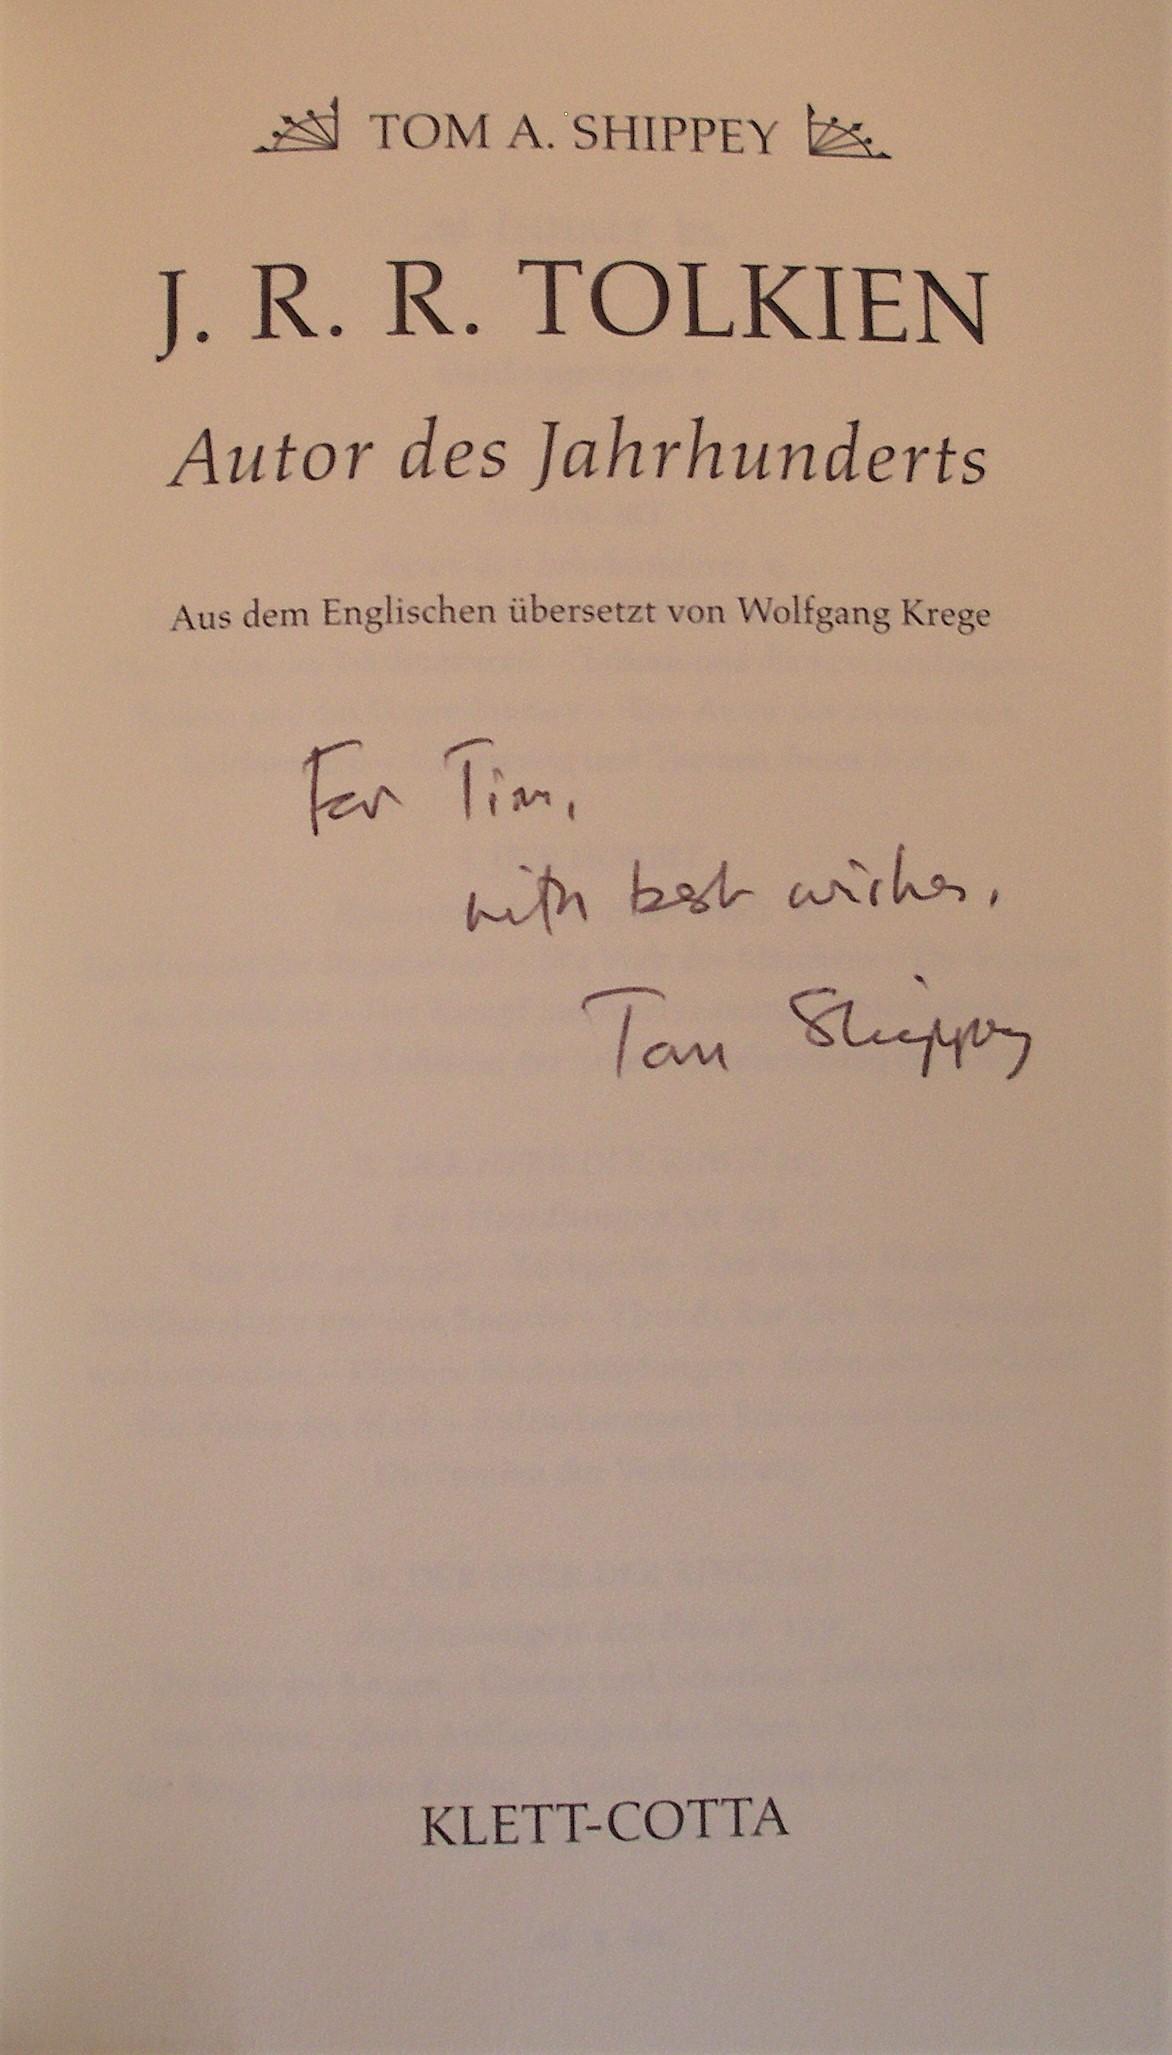 Tom Shippey